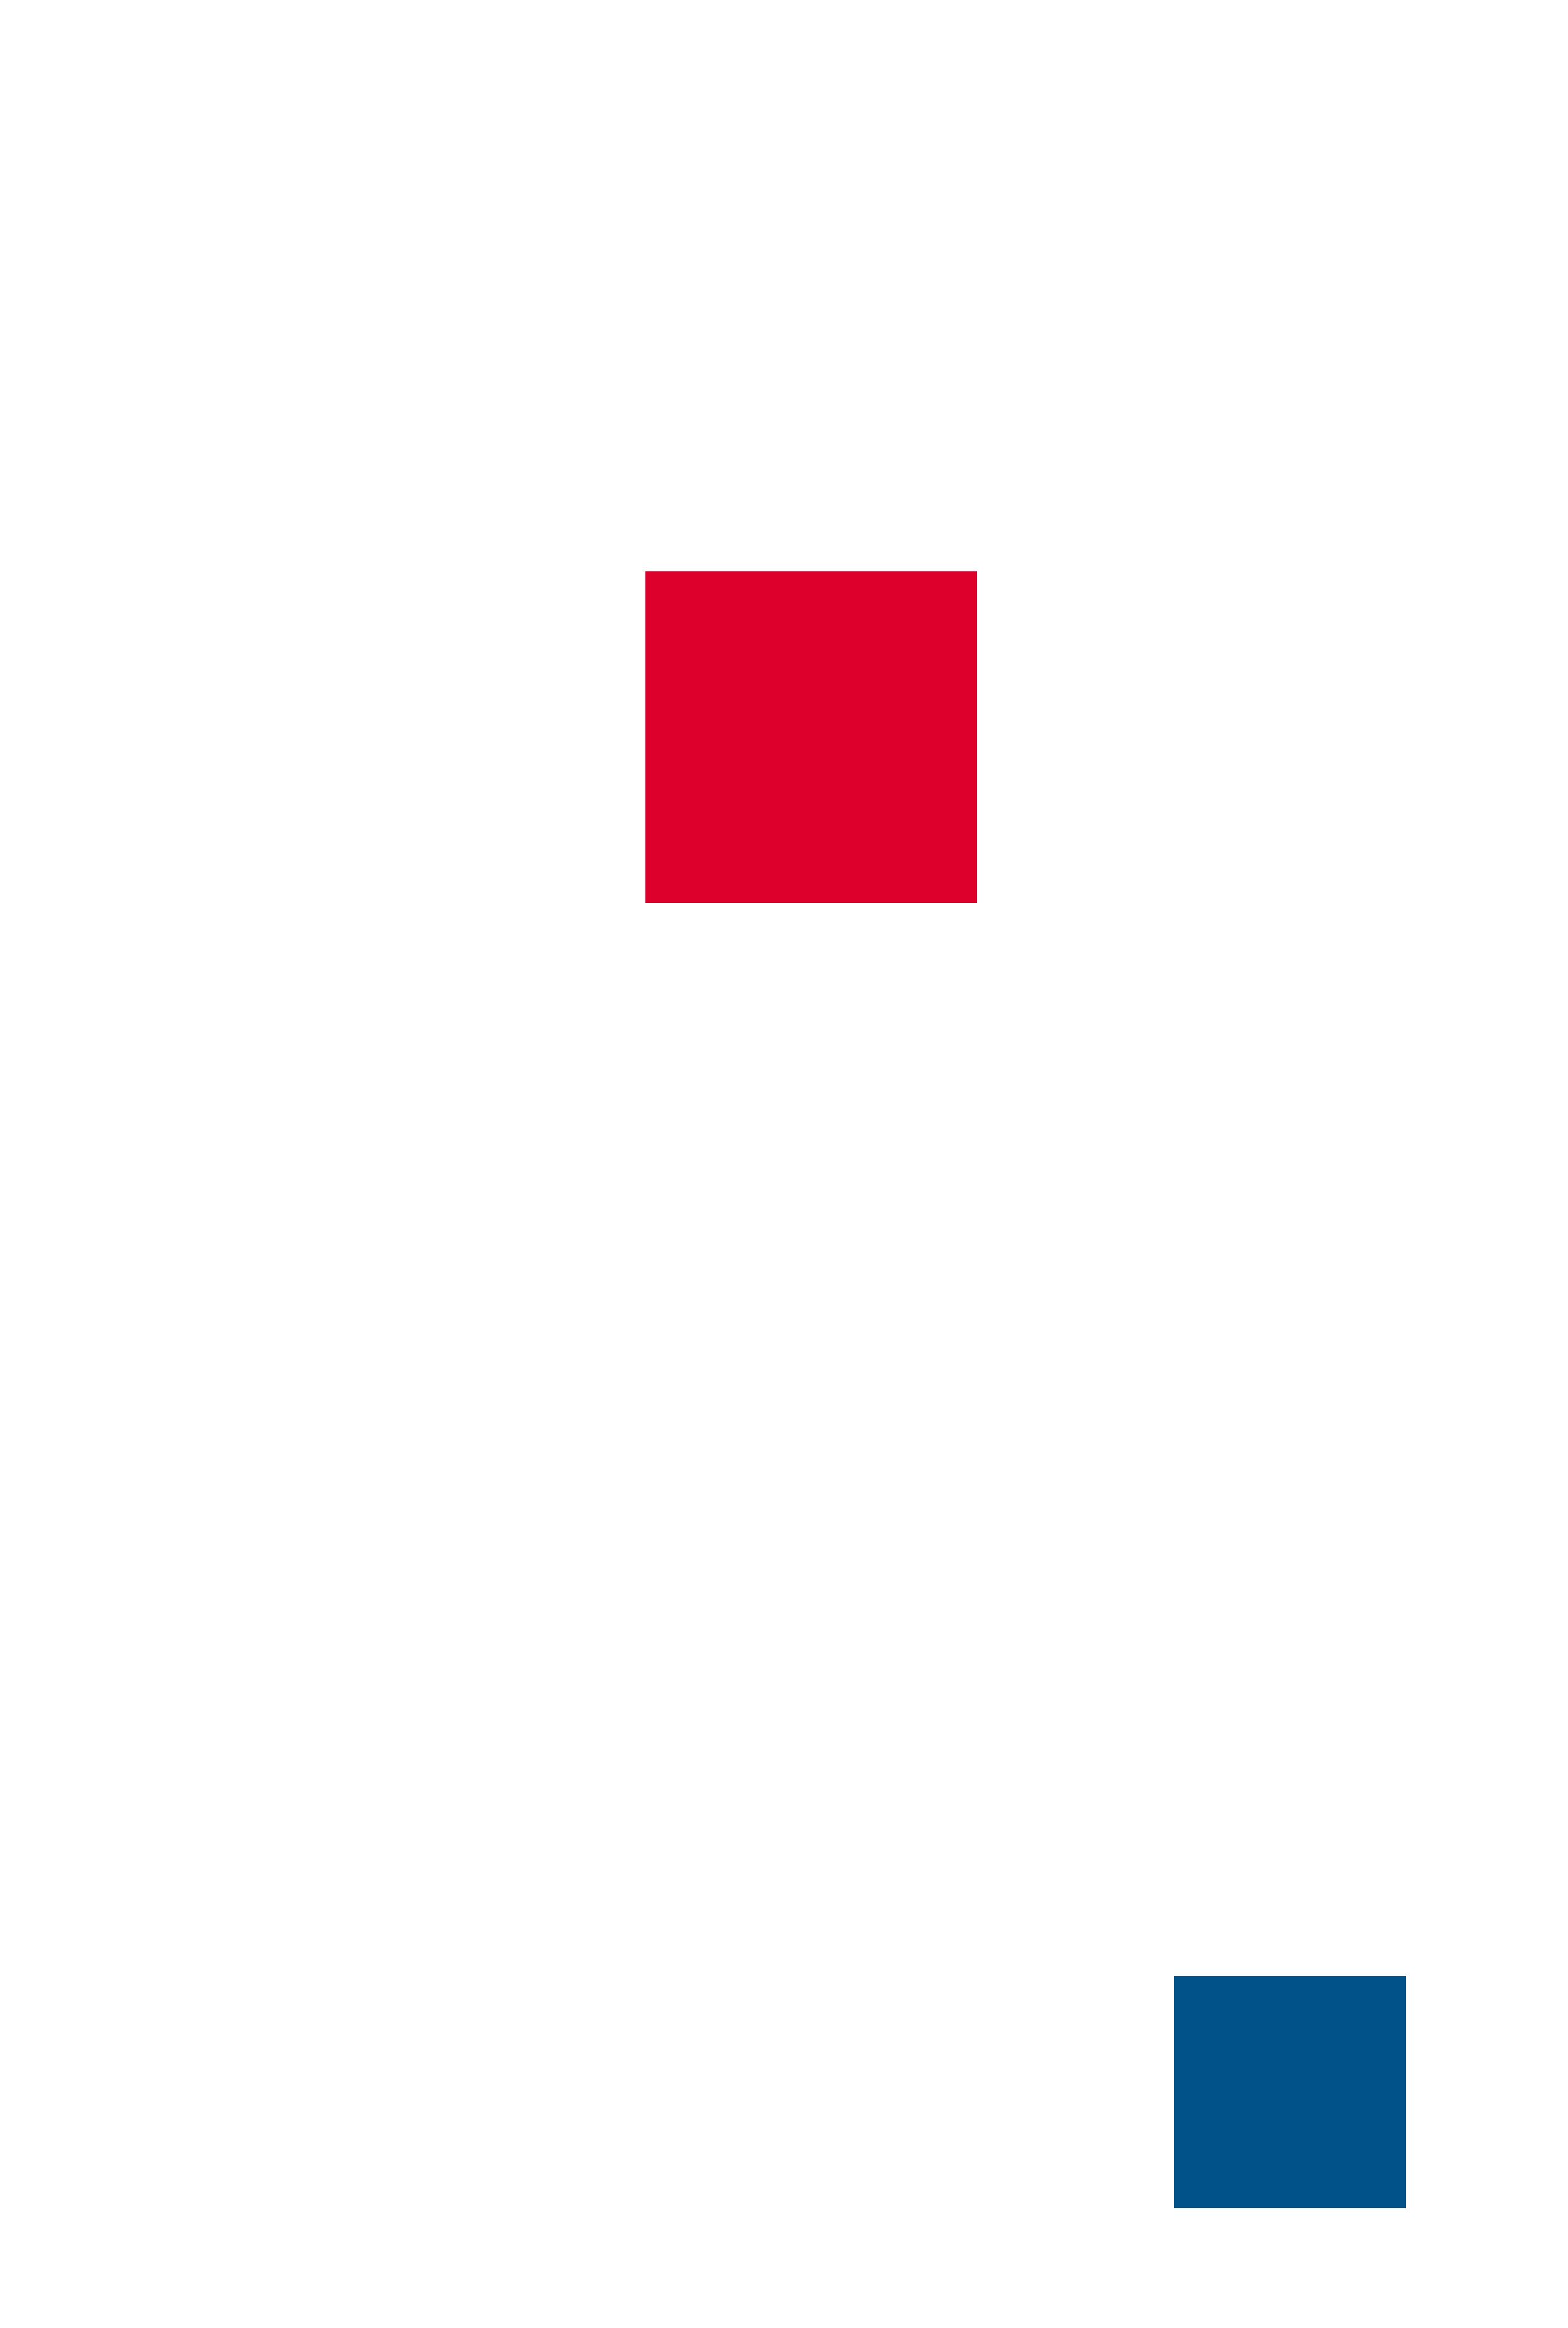 circles-background-tablet-transparant-robert-administratie-financiele-dienstverlening-4